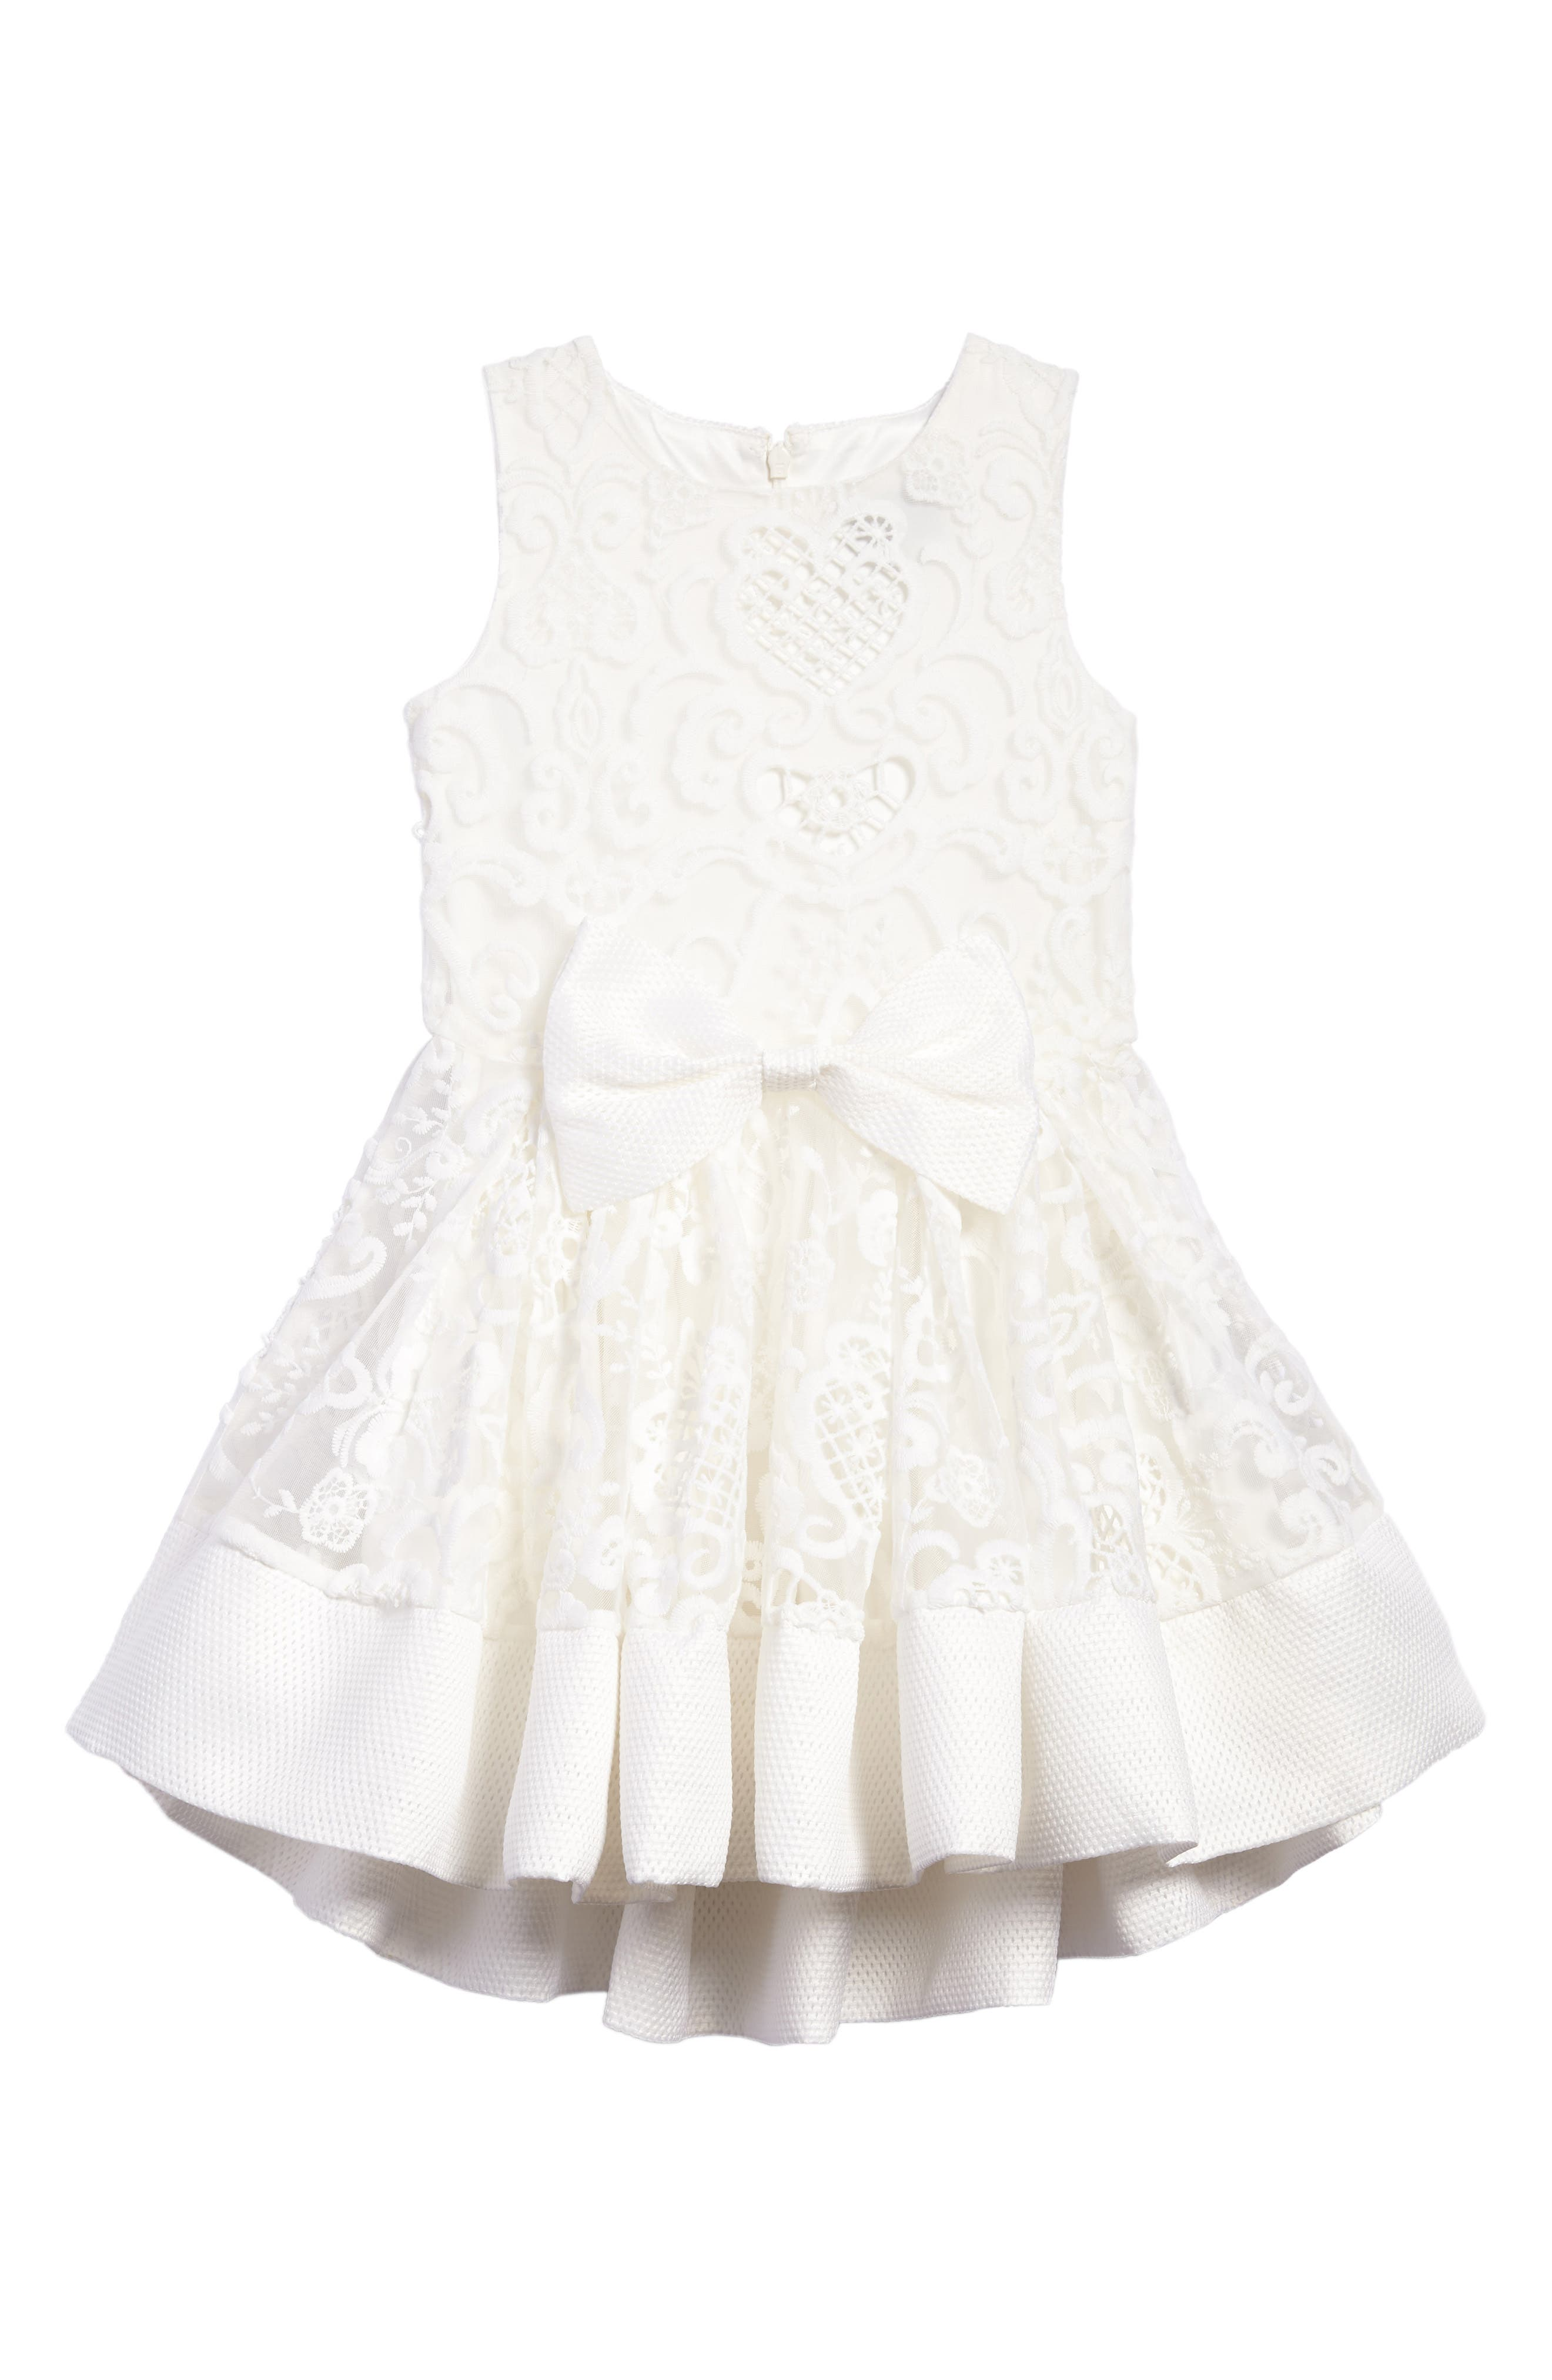 Ava Starlet Dress,                             Main thumbnail 1, color,                             Ivory